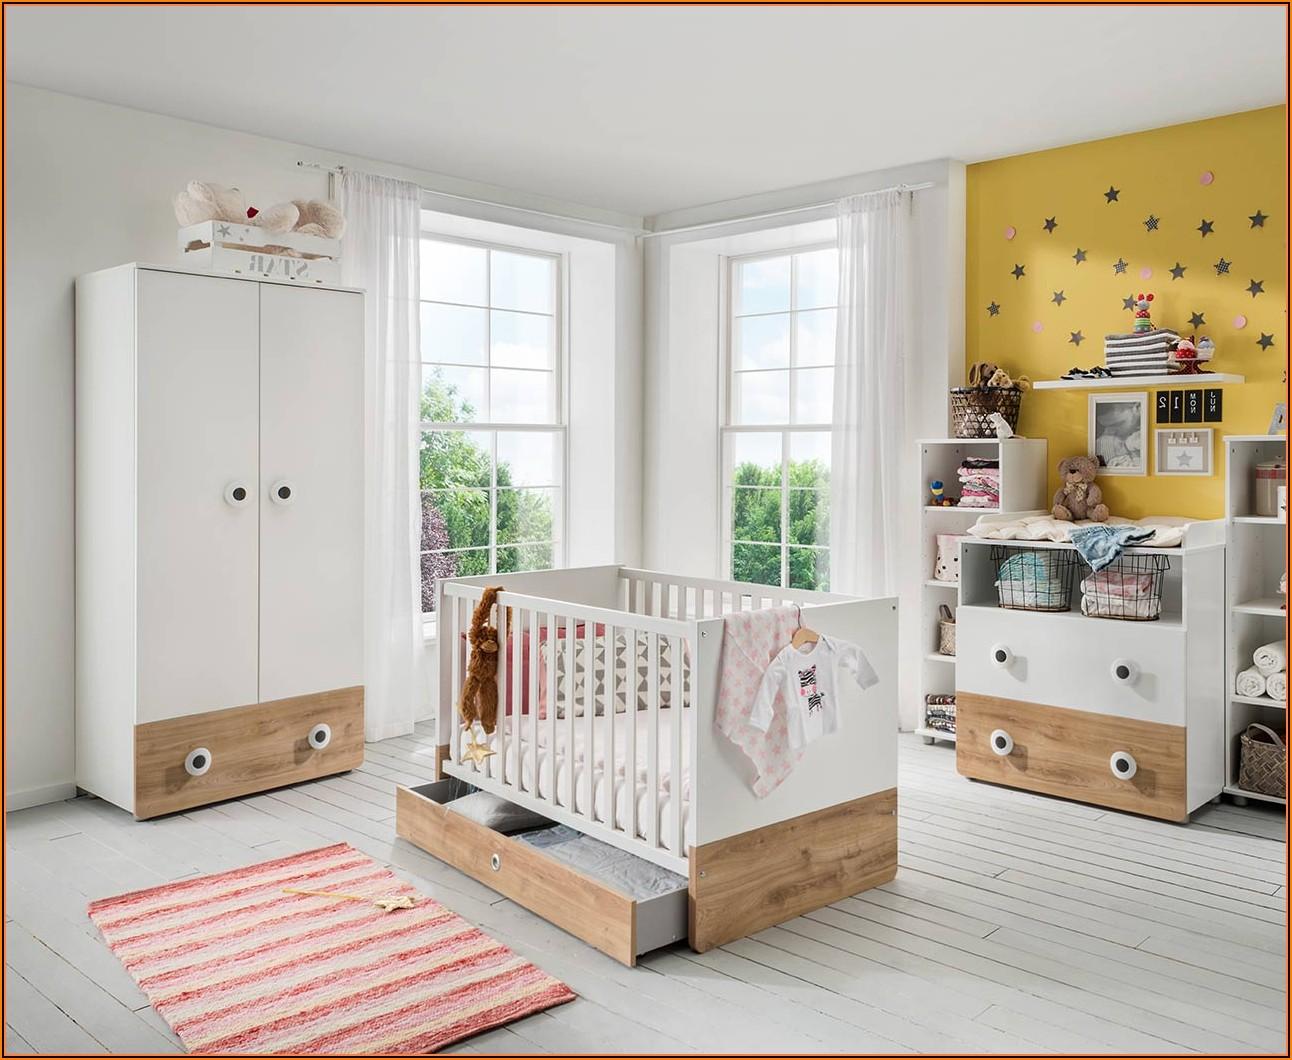 Xxl Lutz Möbel Kinderzimmer Komplett